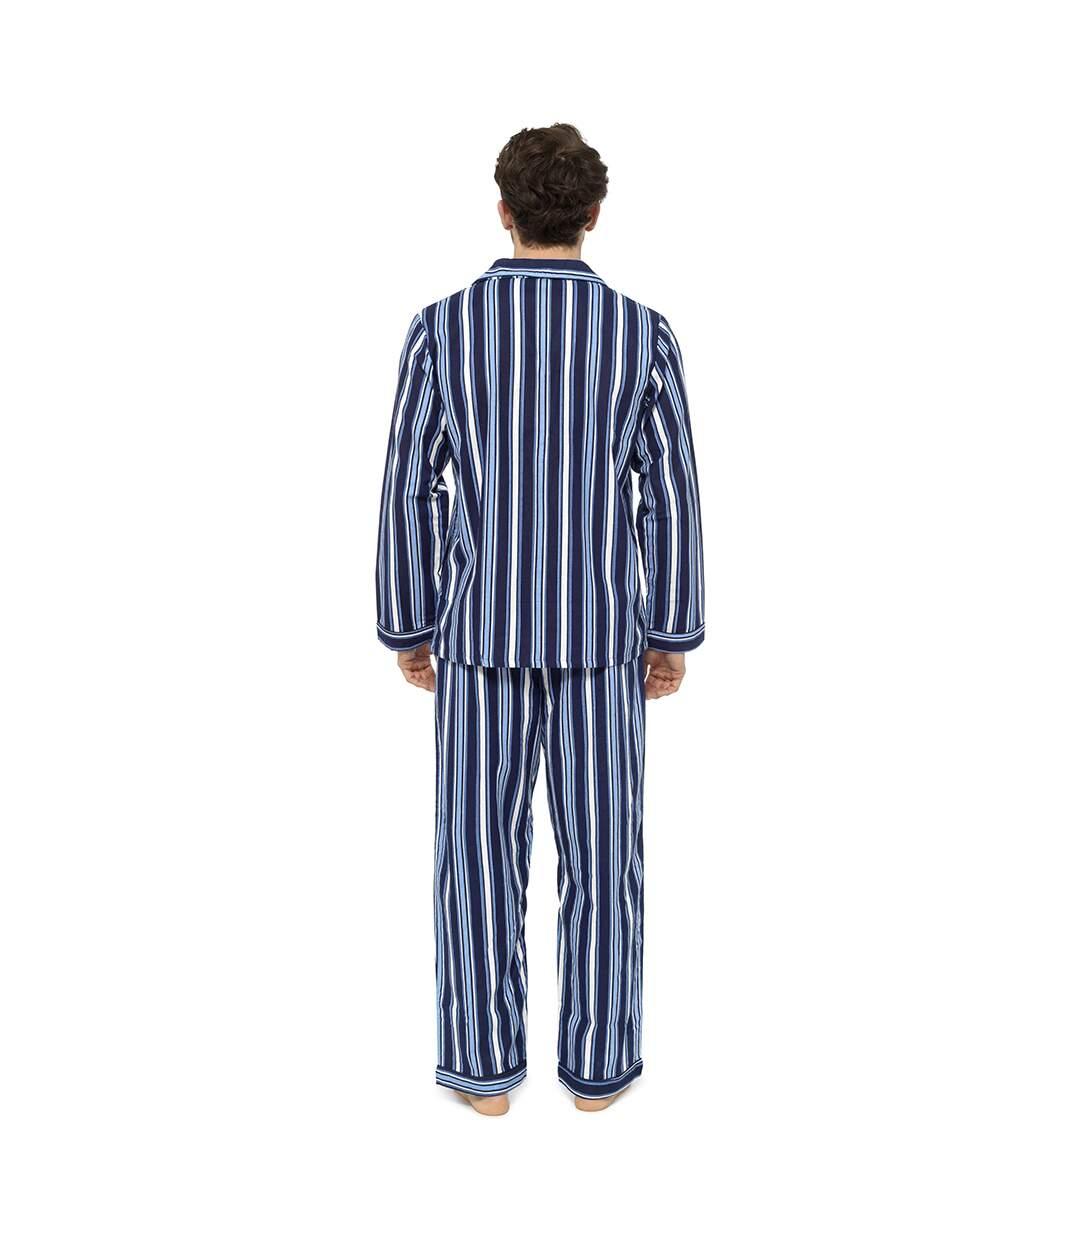 Tom Franks Mens Striped Flannel Pyjama Set (Blue) - UTUT548